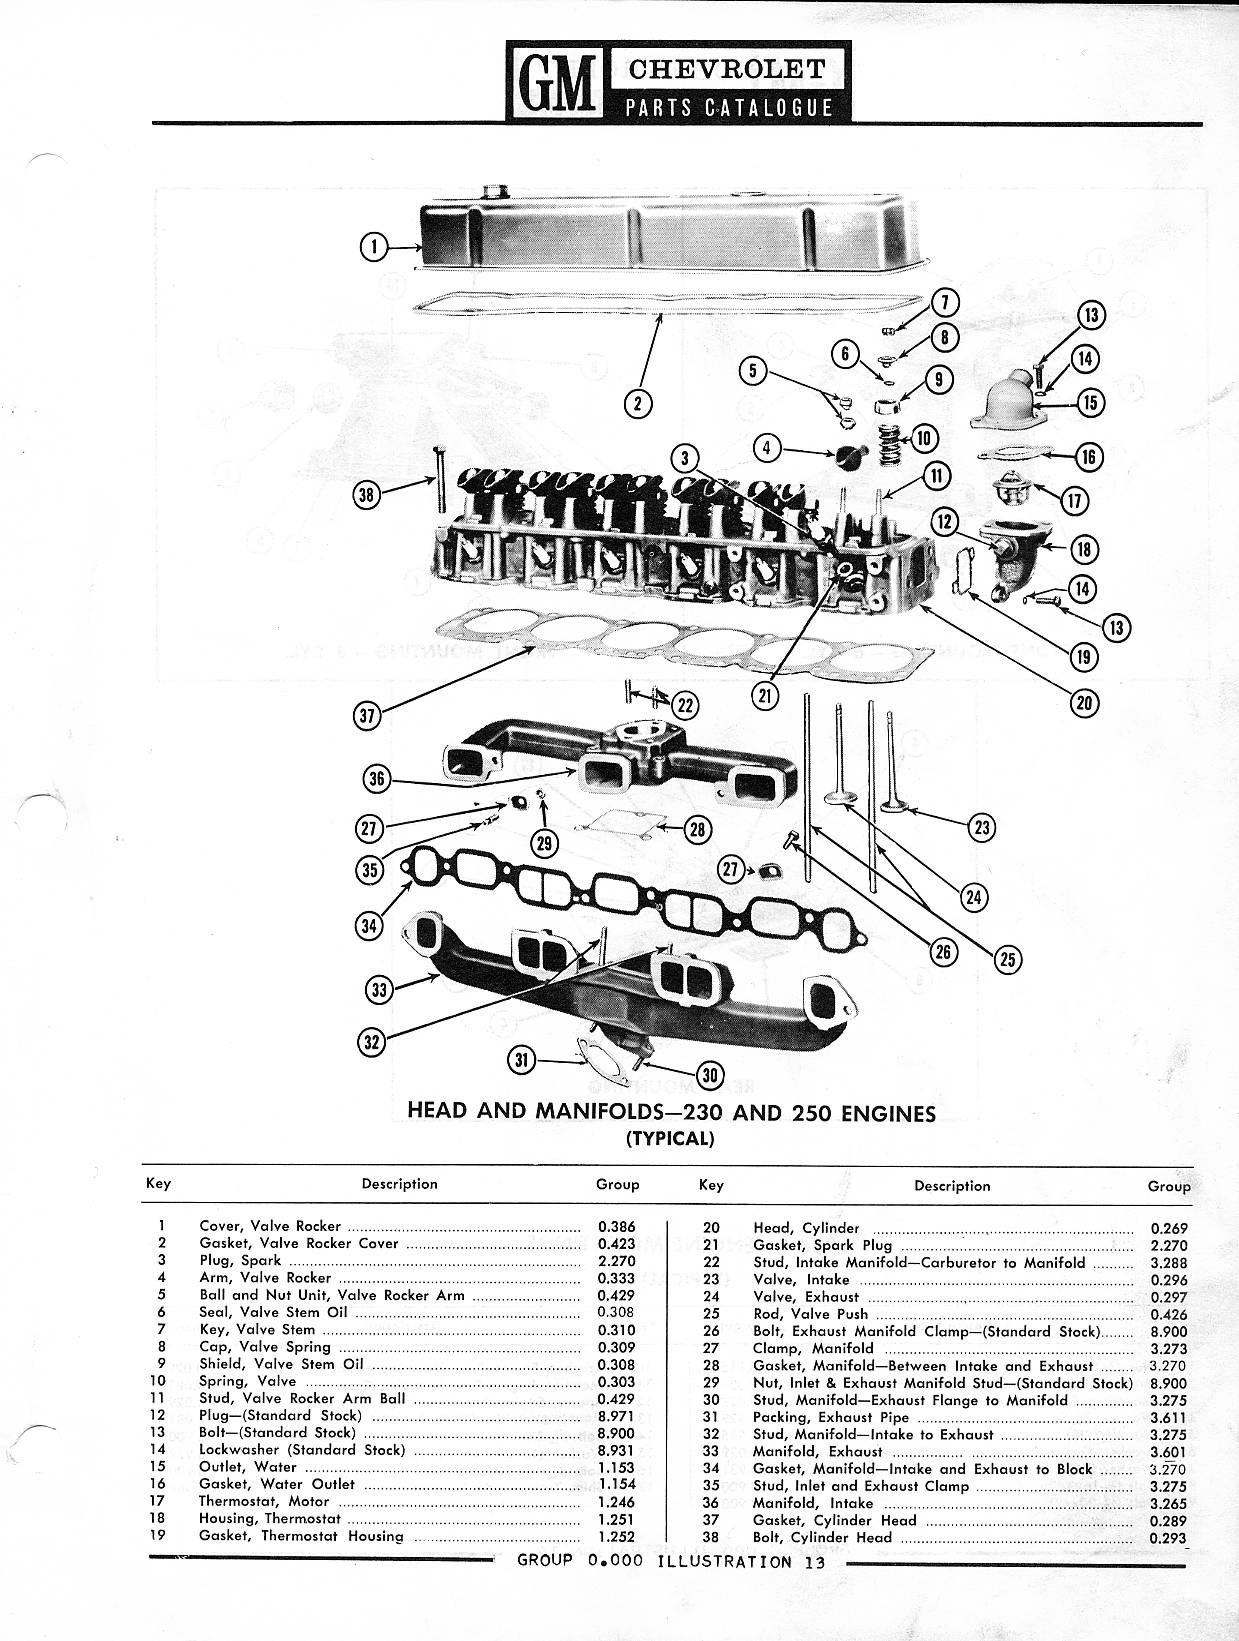 1958-1968 Chevrolet Parts Catalog / Image128.jpg